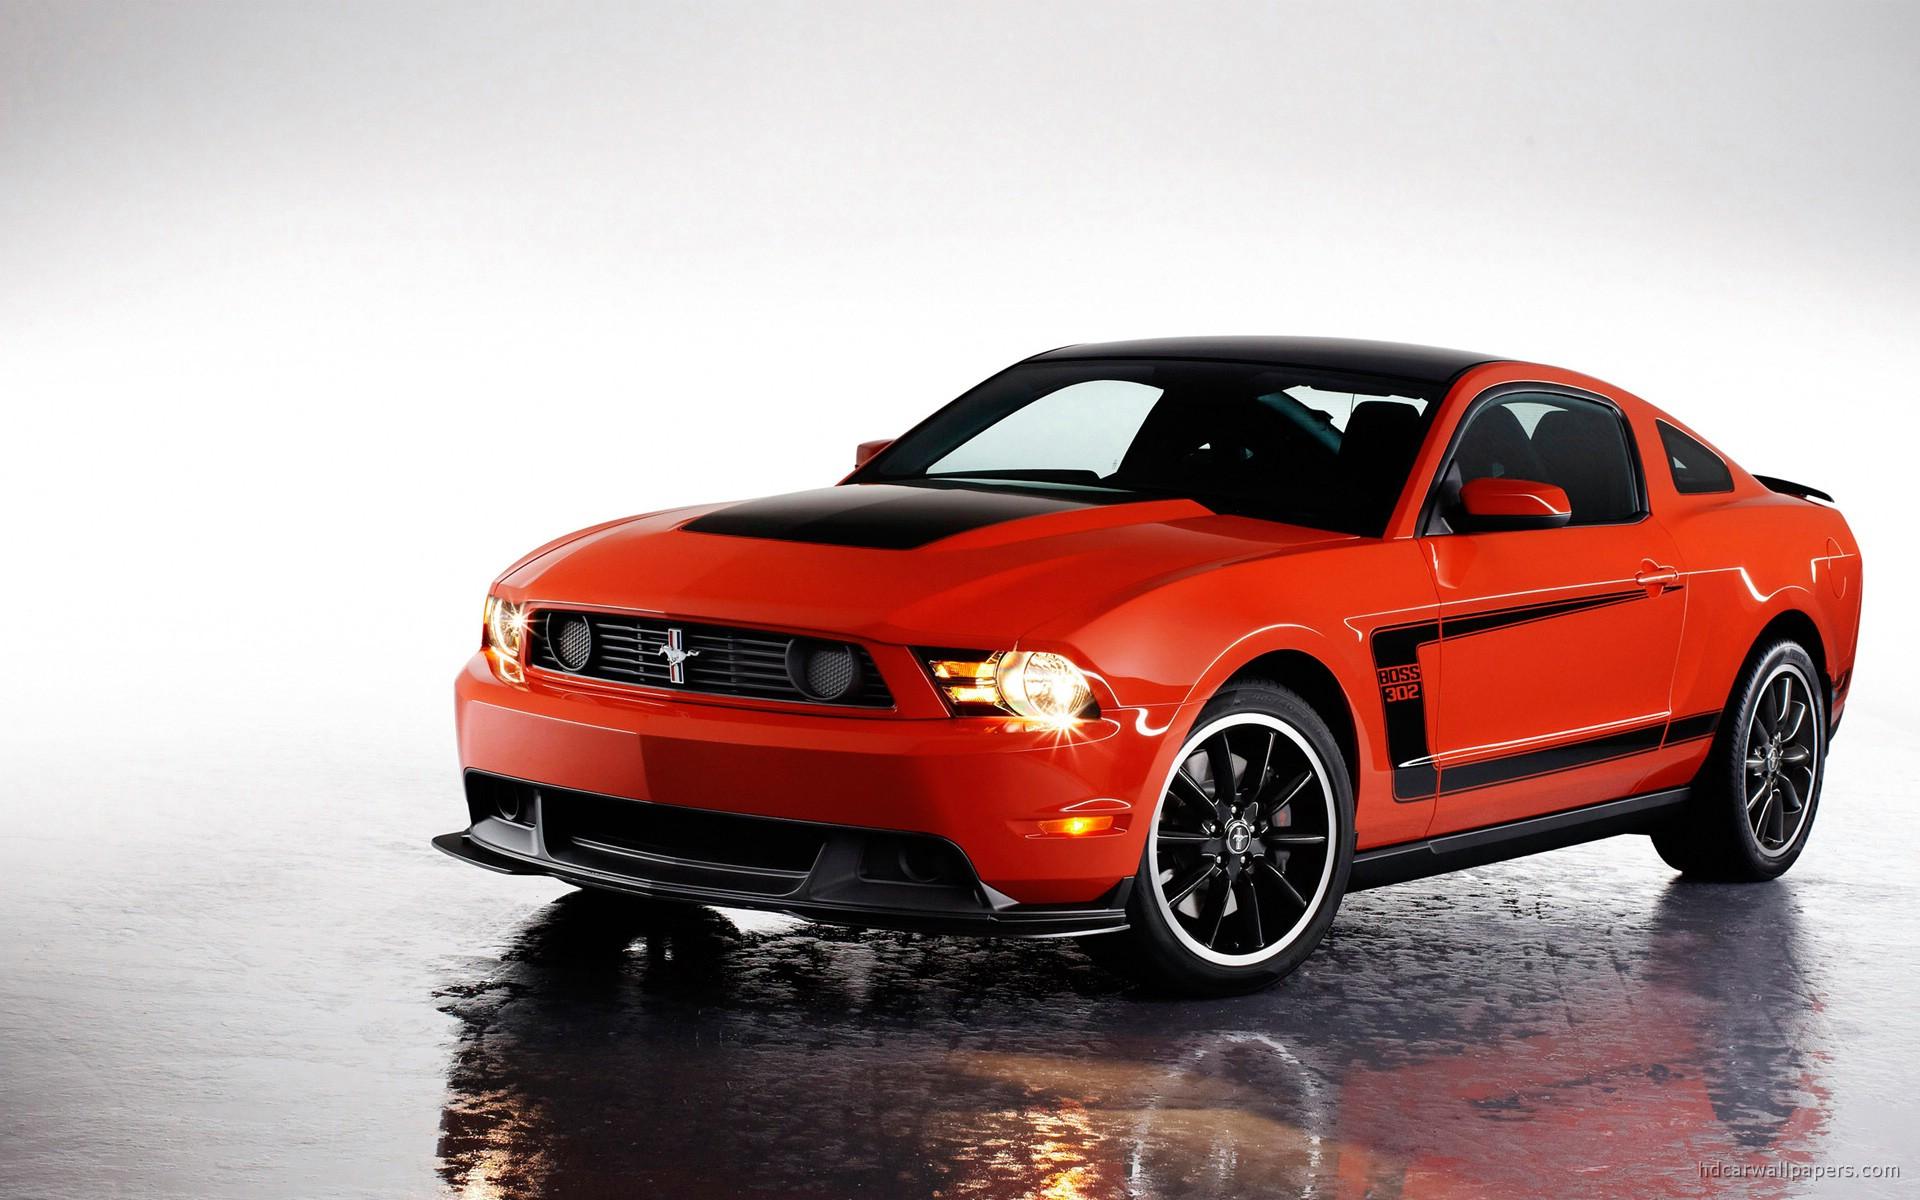 2012 Ford Mustang Boss 3 Wallpaper Hd Car Wallpapers Id 1870